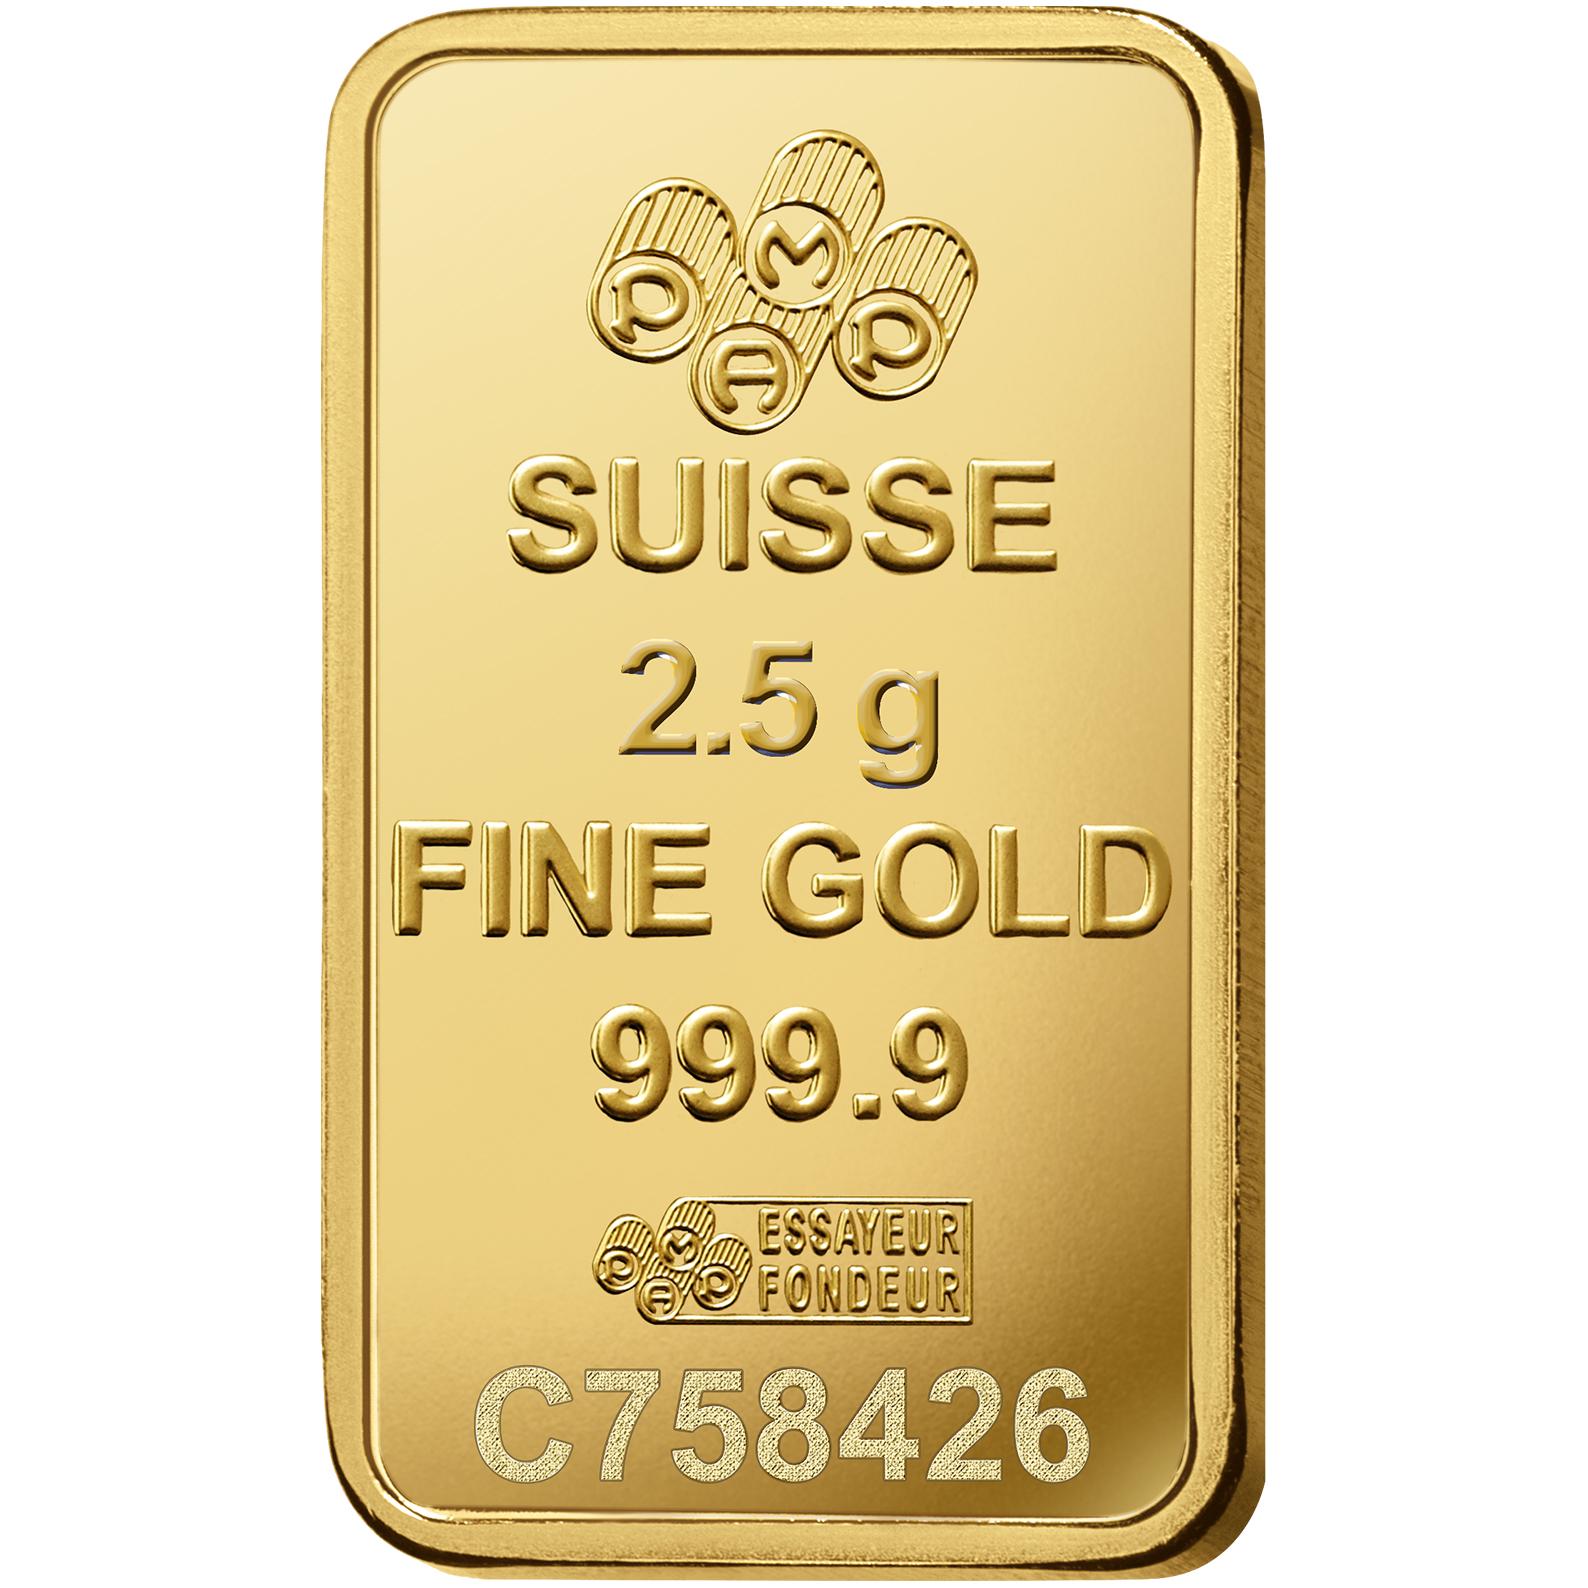 2,5 grammi lingottino d'oro puro 999.9 - PAMP Suisse Rosa